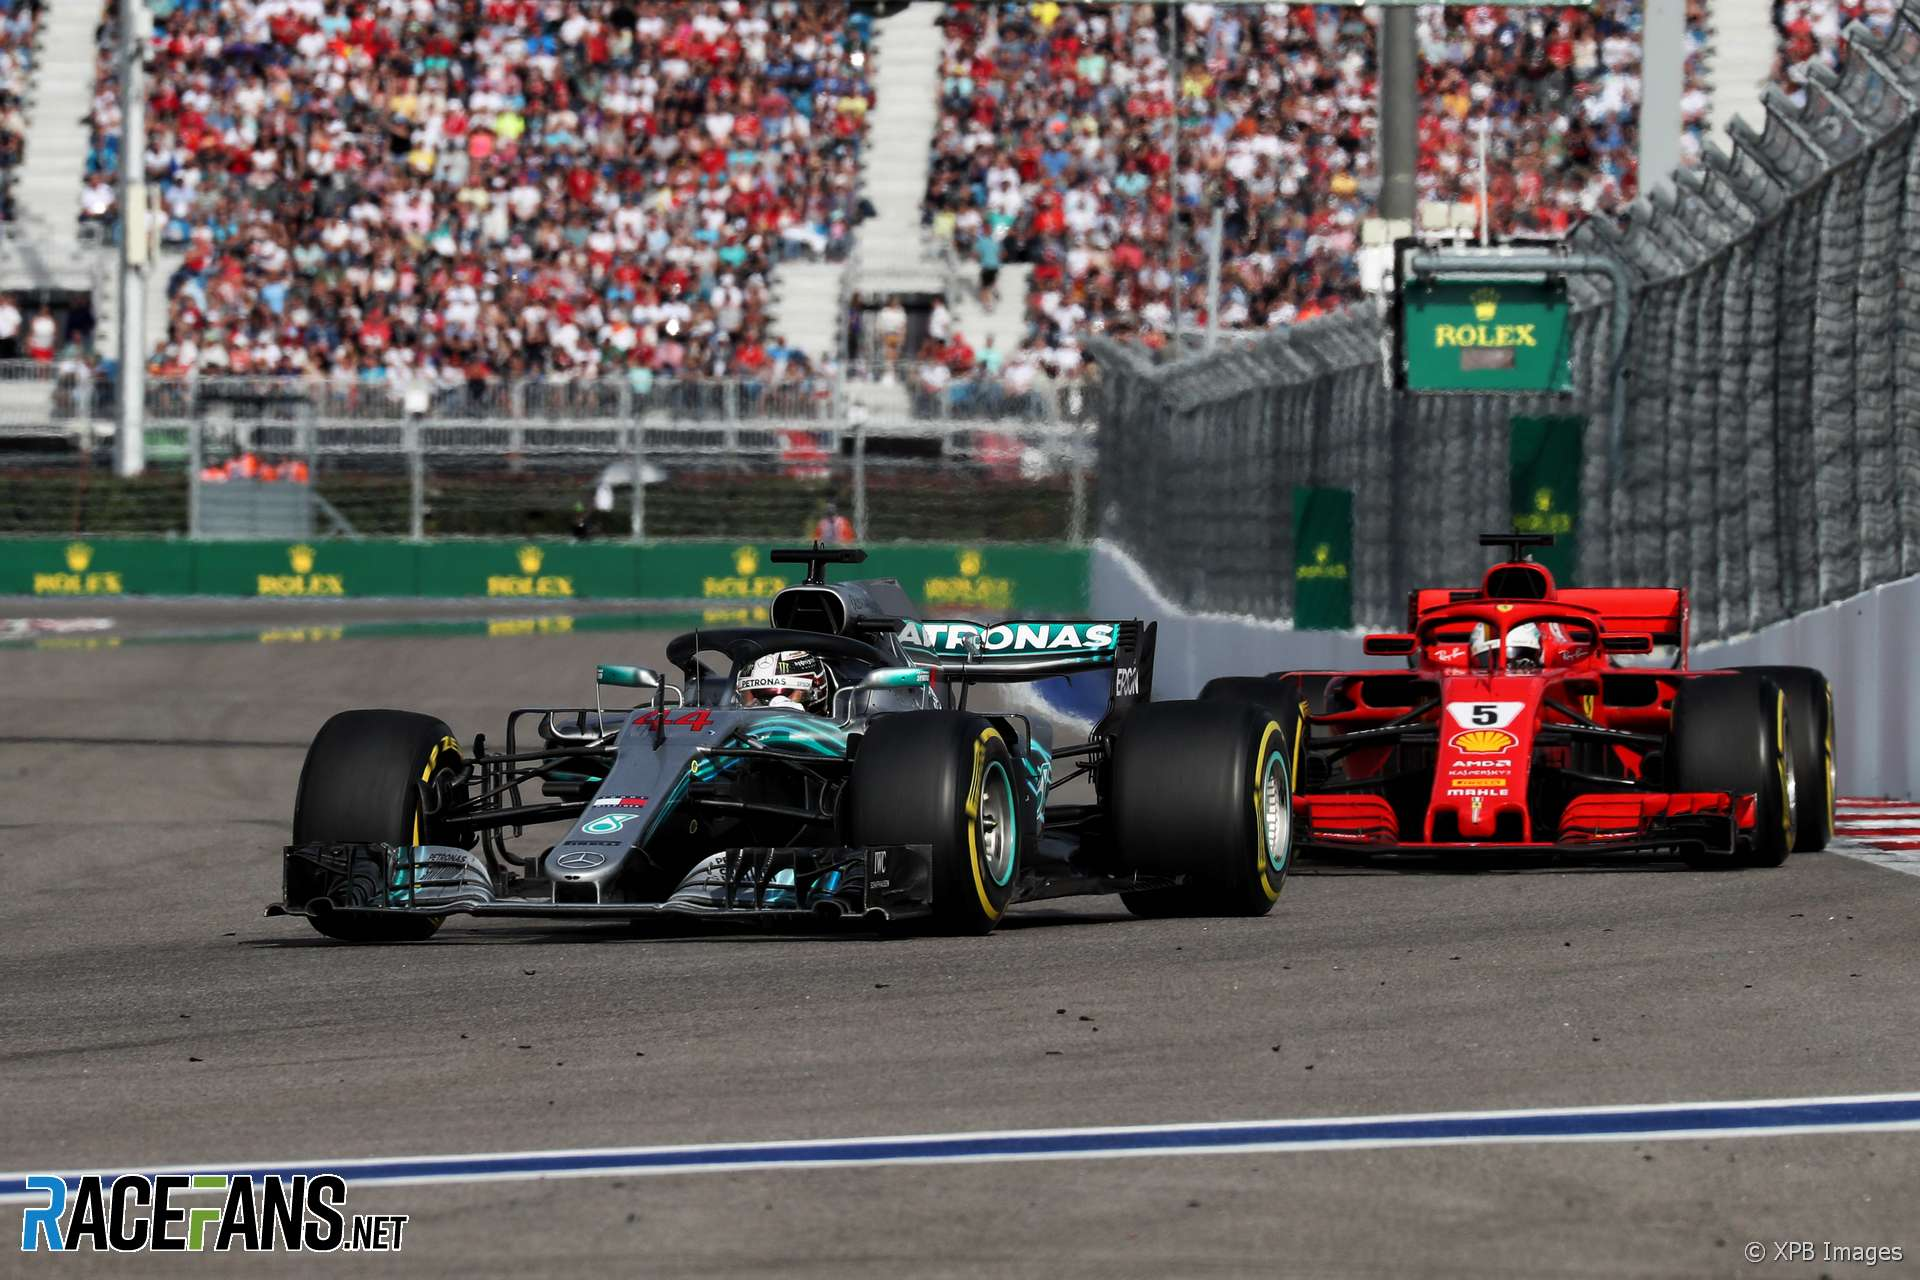 Lewis Hamilton, Sebastian Vettel, Sochi Autodrom, 2018